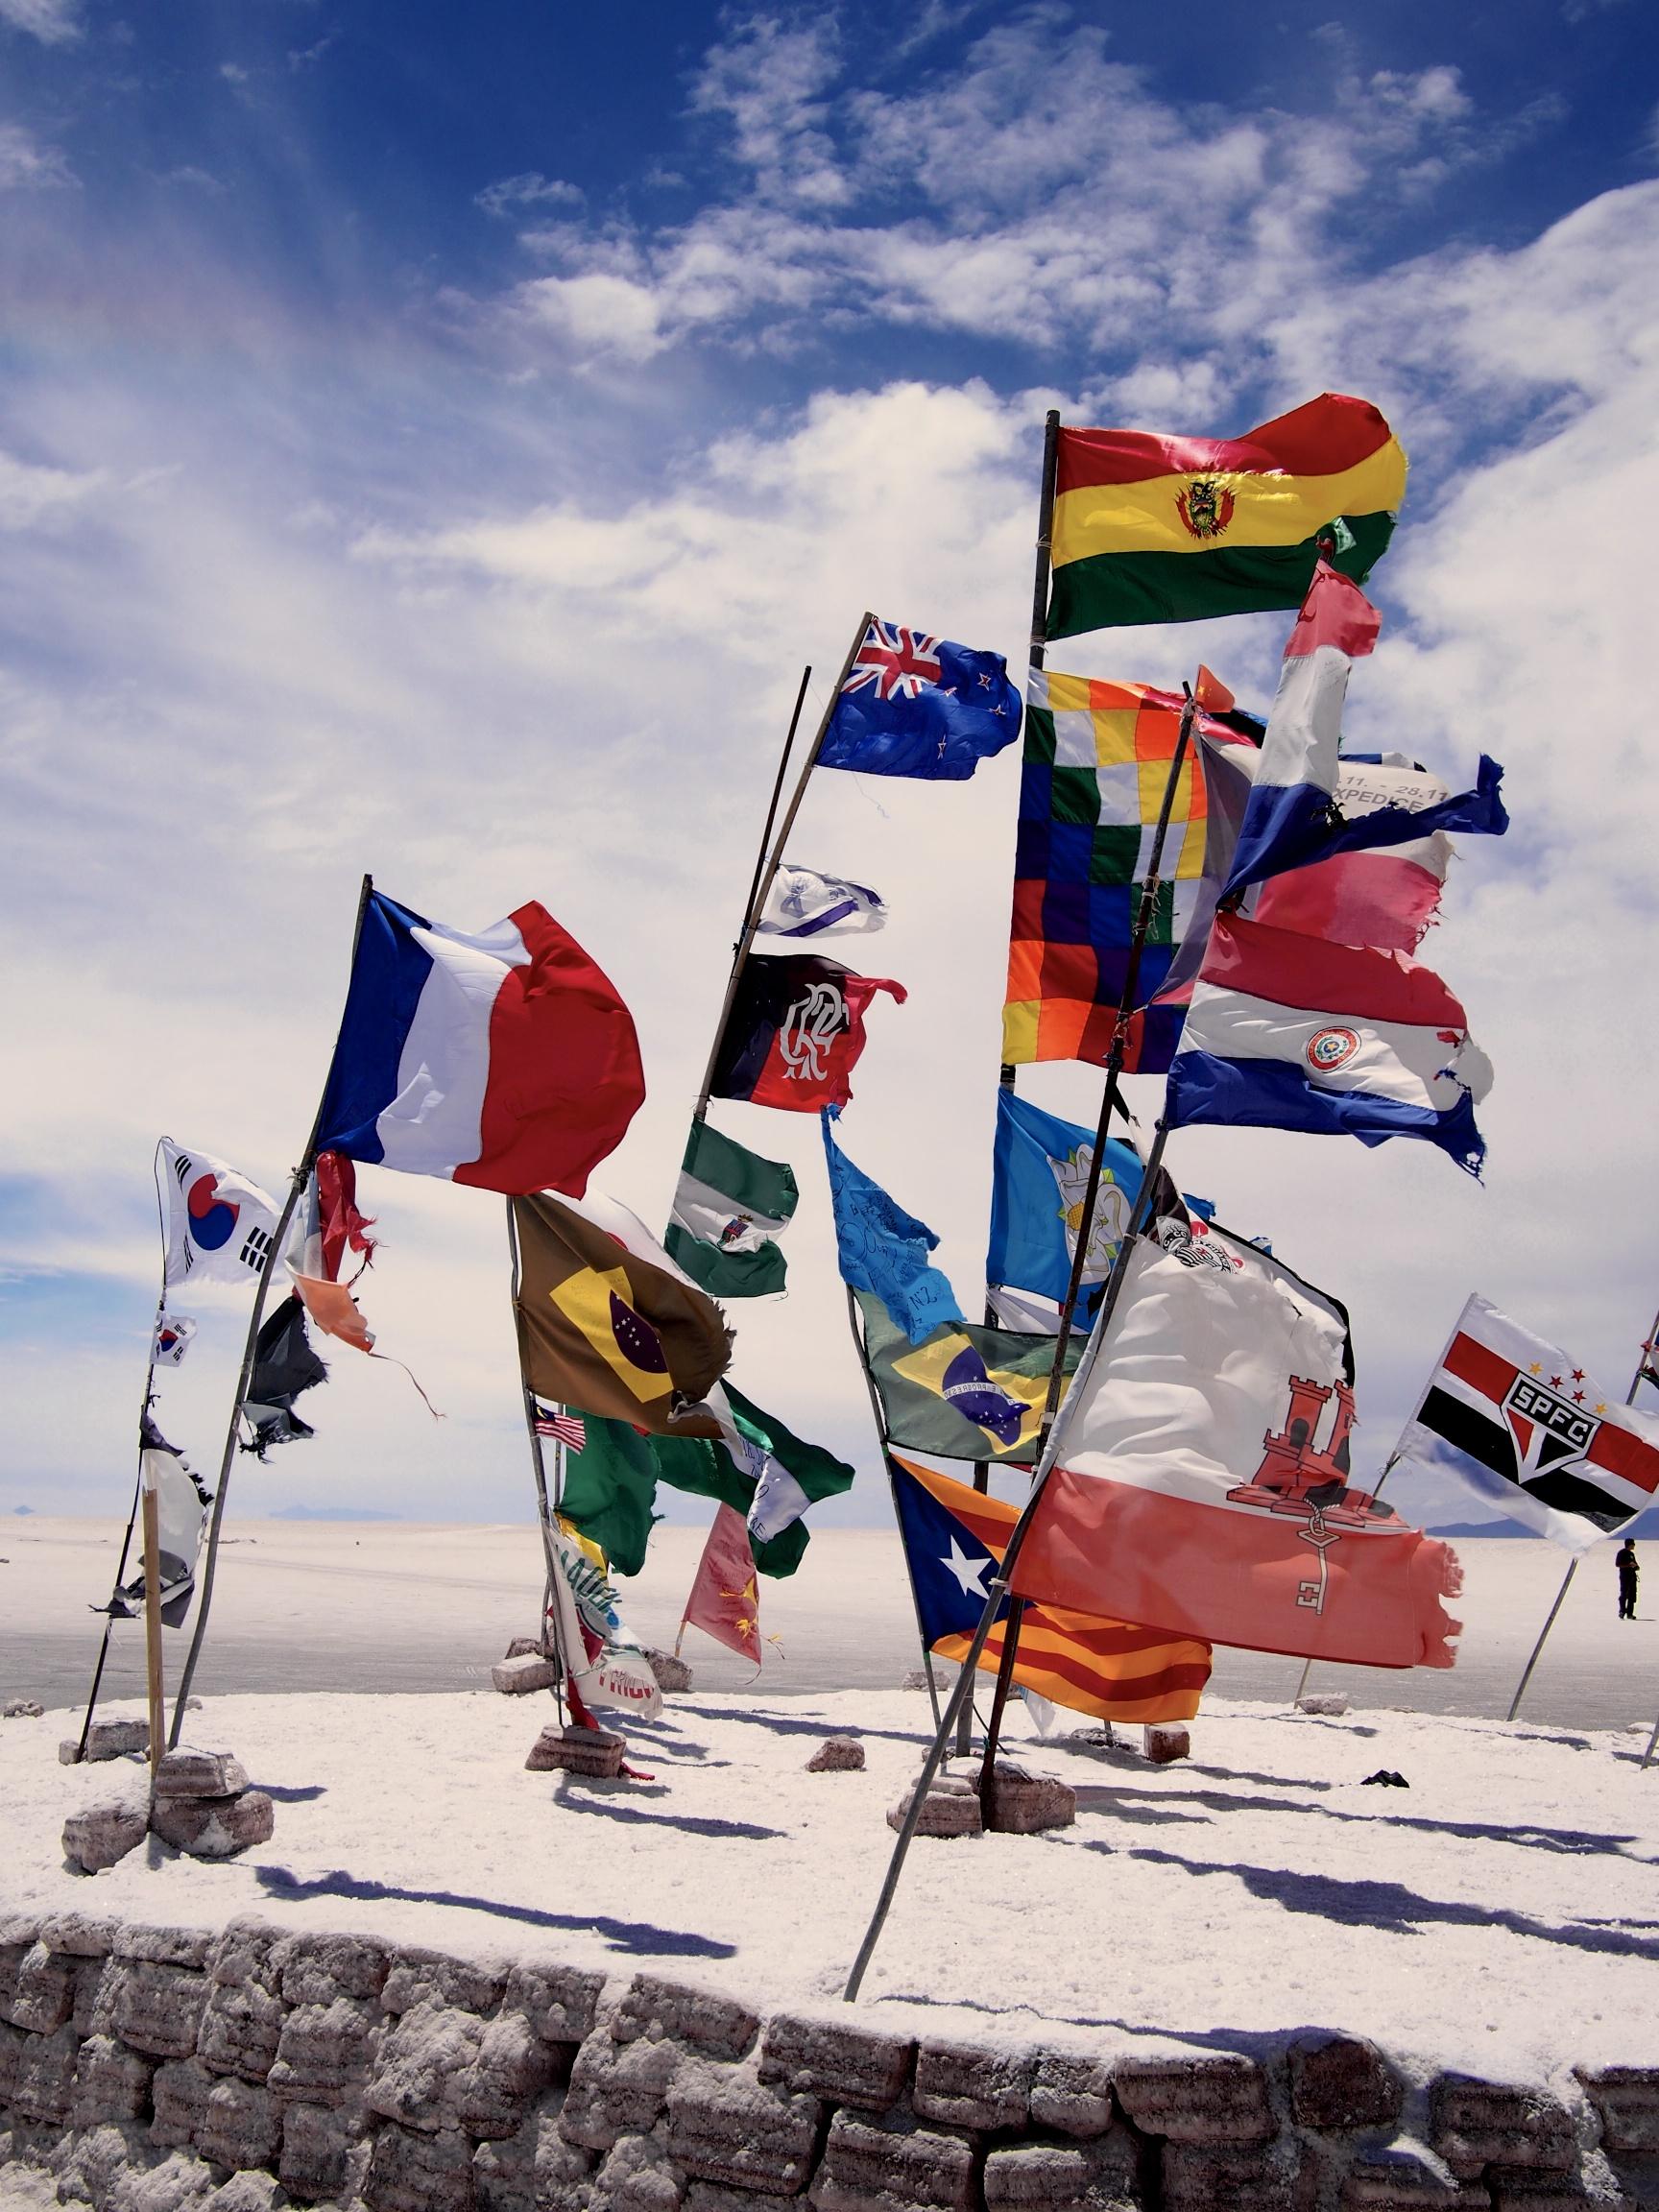 World flags outside Hotel de Sal,the original salt hotel